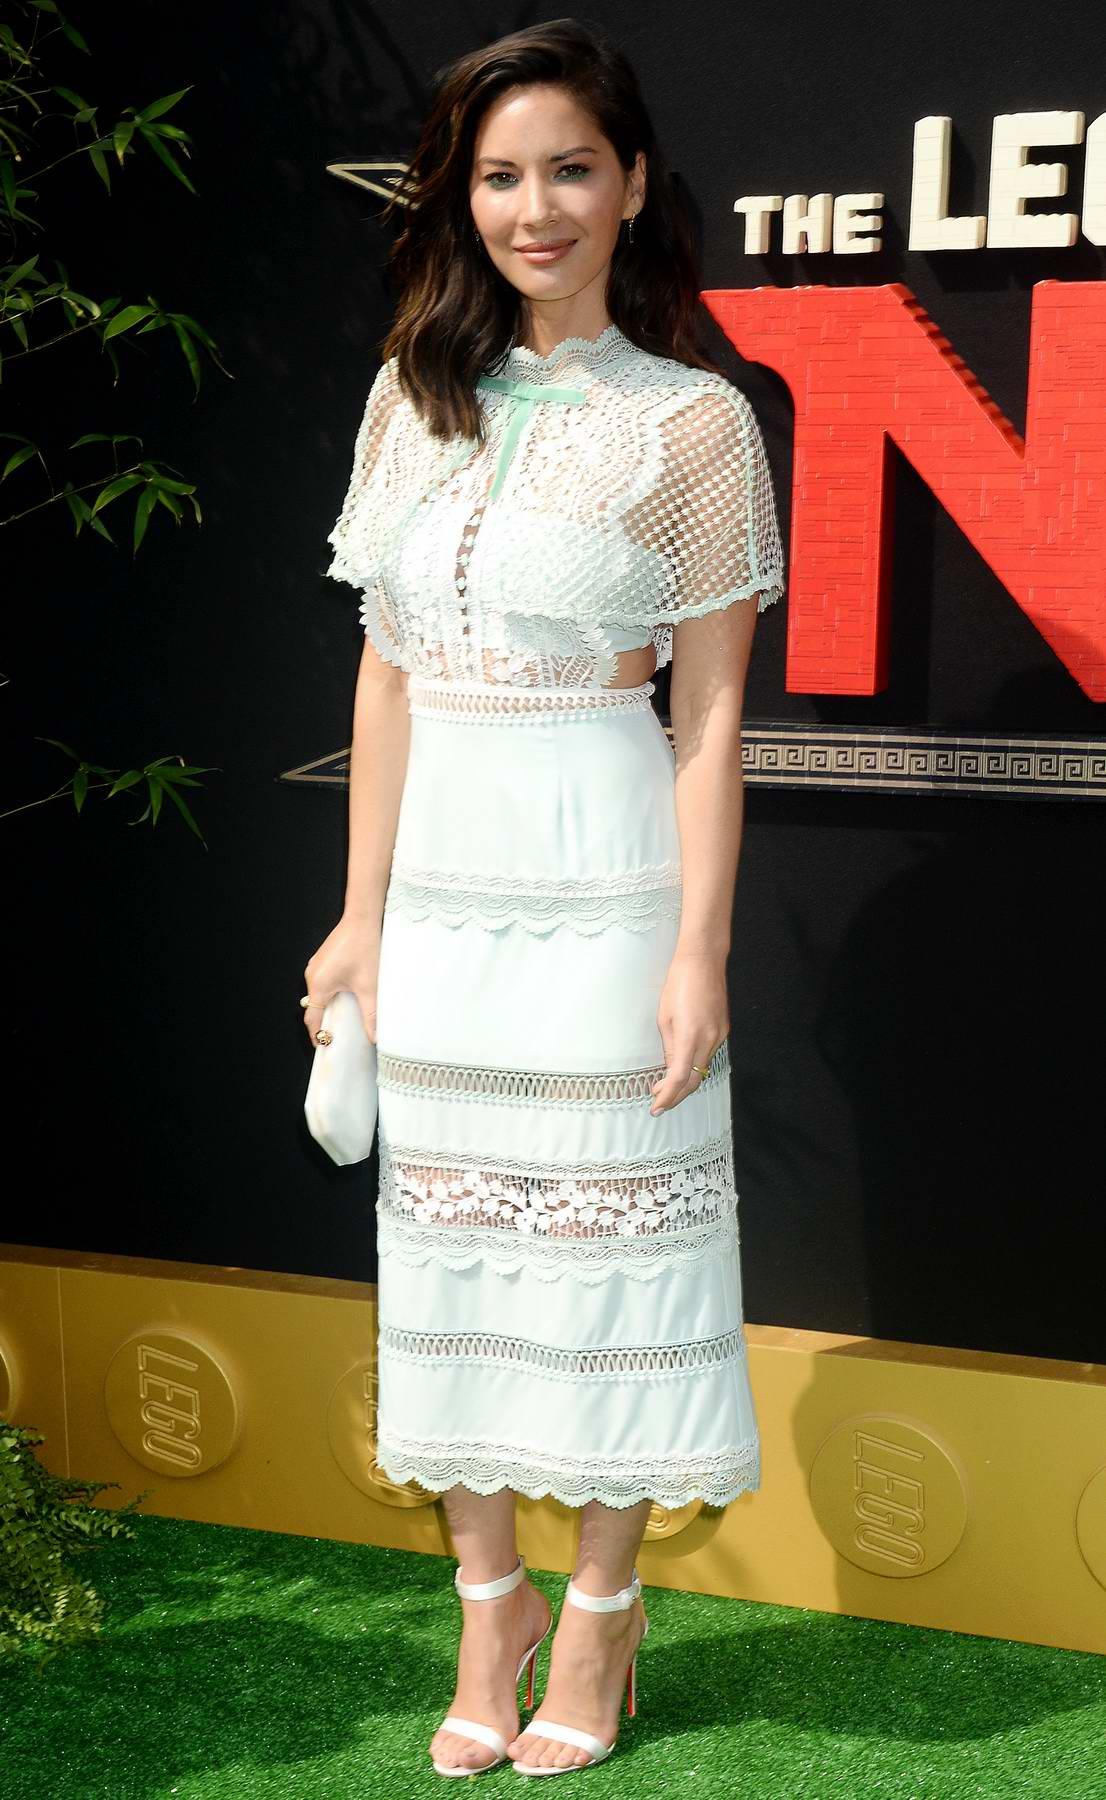 Olivia Munn attends The Lego Ninjago movie premiere in Los Angeles